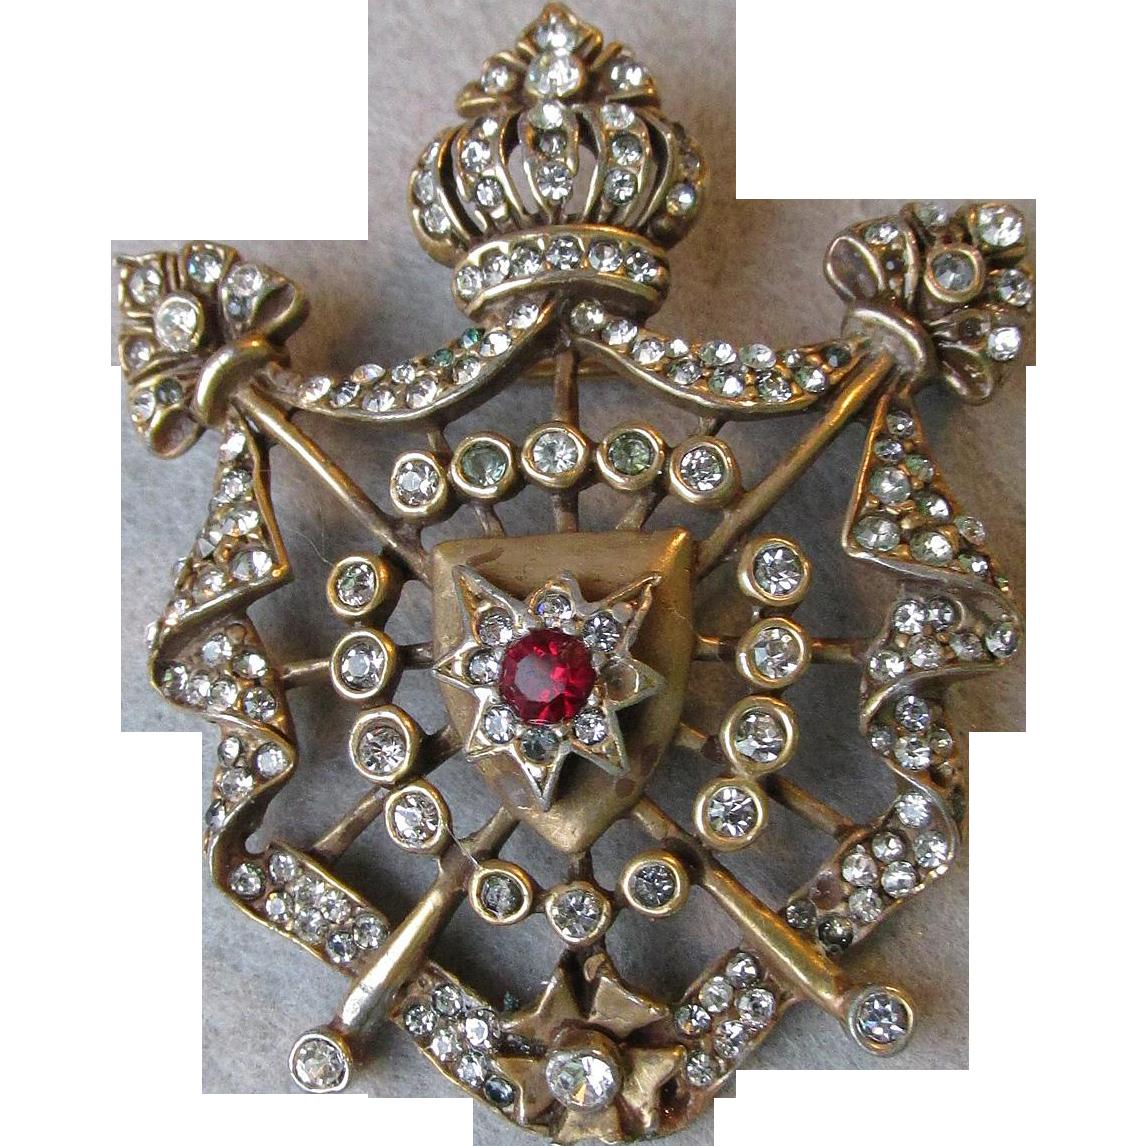 Signed Hattie Carnegie Vintage Rhinestone Heraldic Crown & Shield Pin